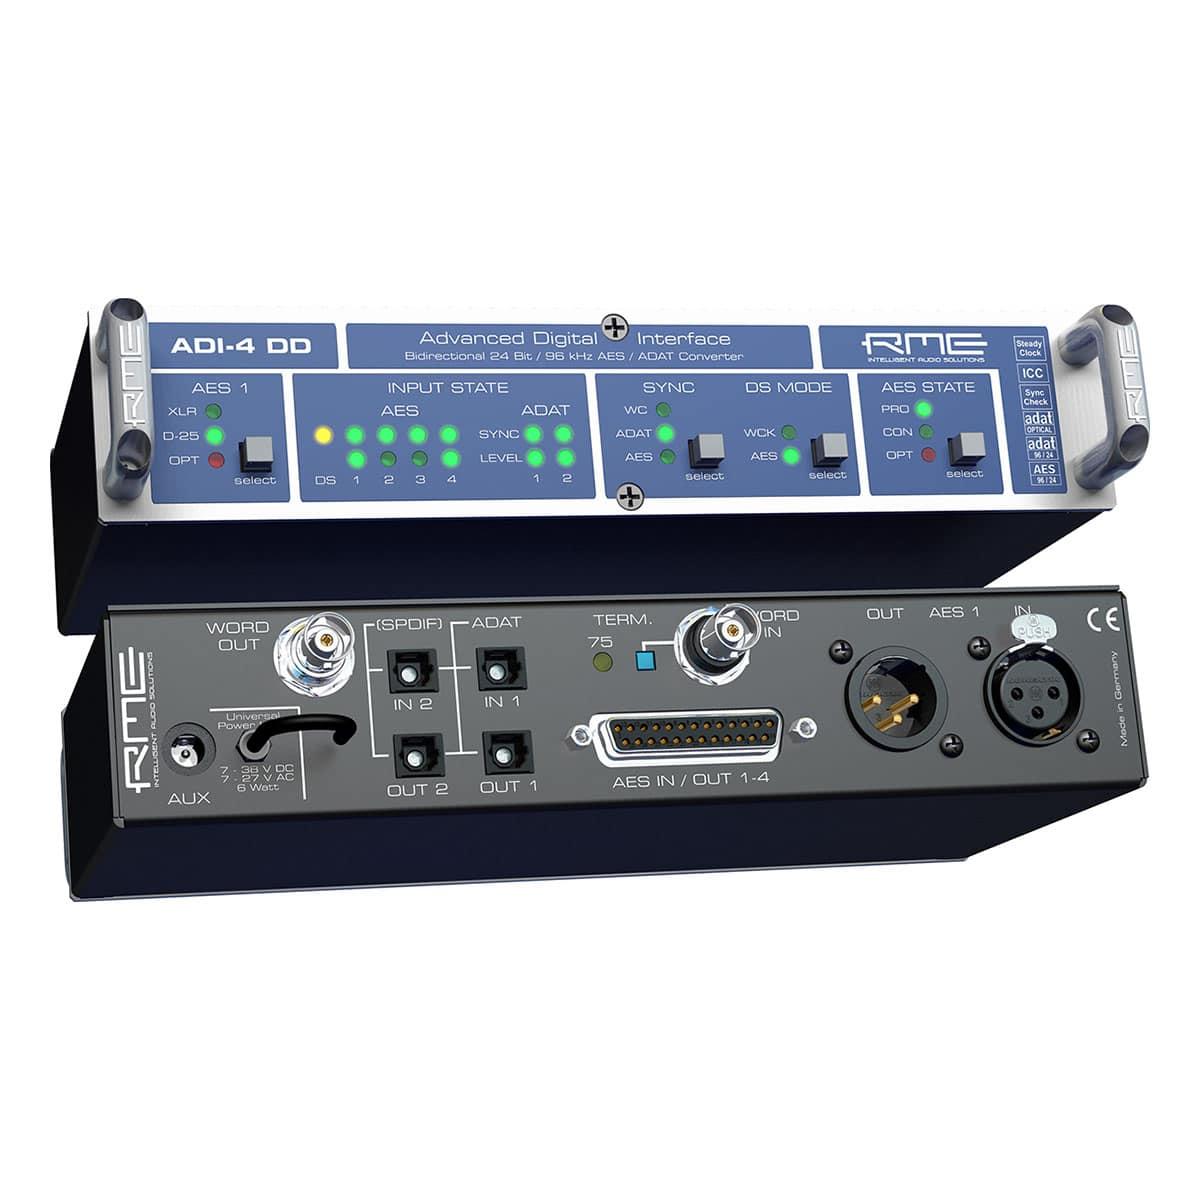 RME ADI 4 DD 06 Convertitori Audio, Pro Audio, Audio Digitale